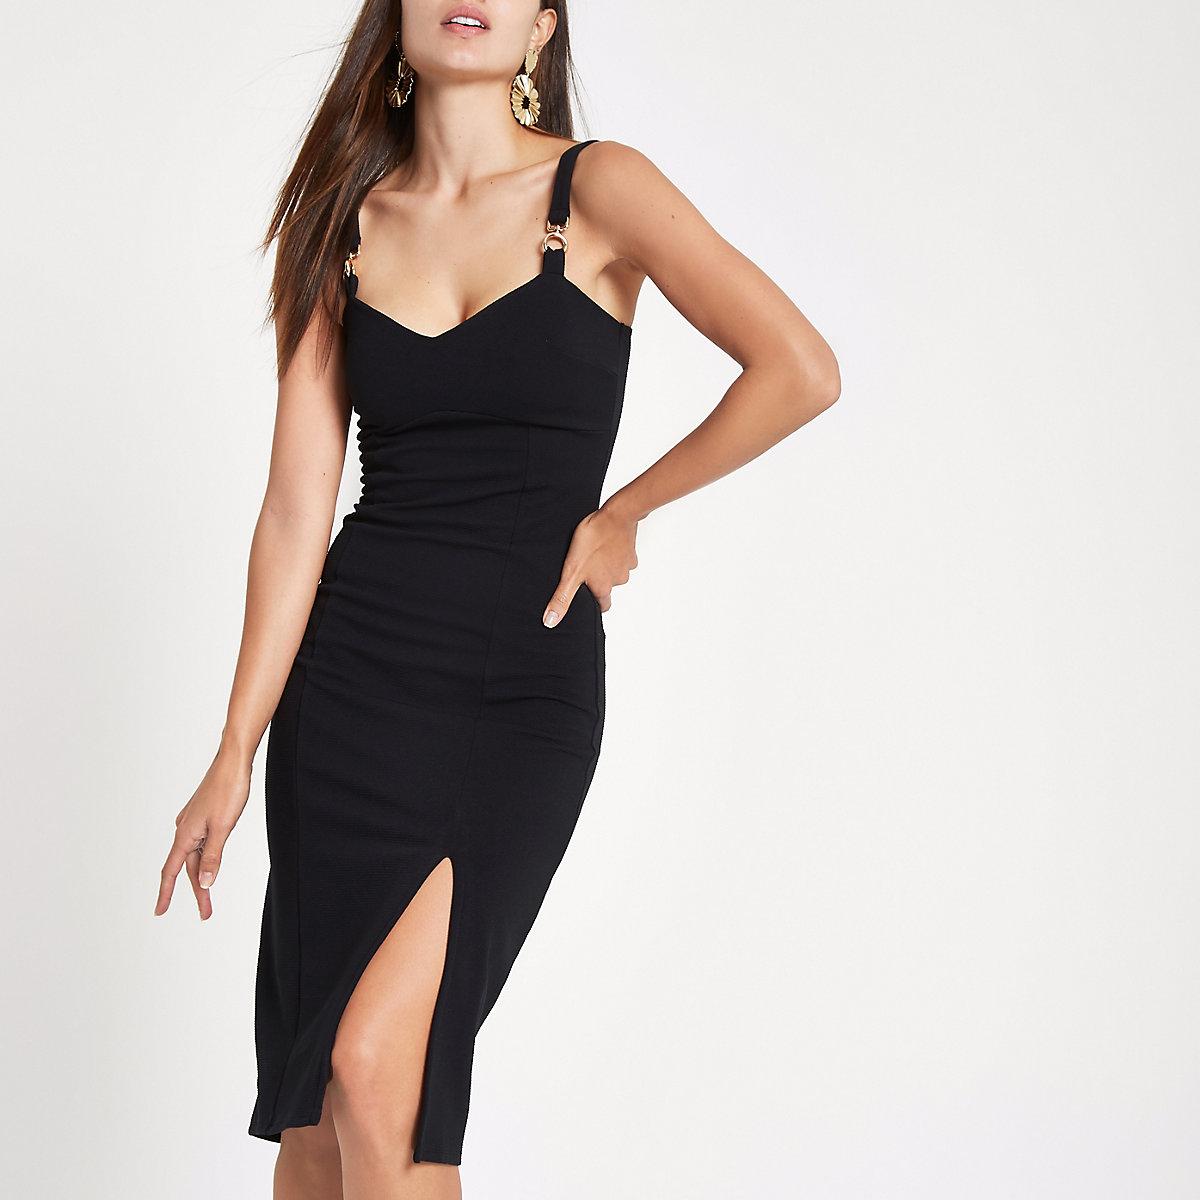 Zwarte geribbelde midi-jurk met bandjes en gesp